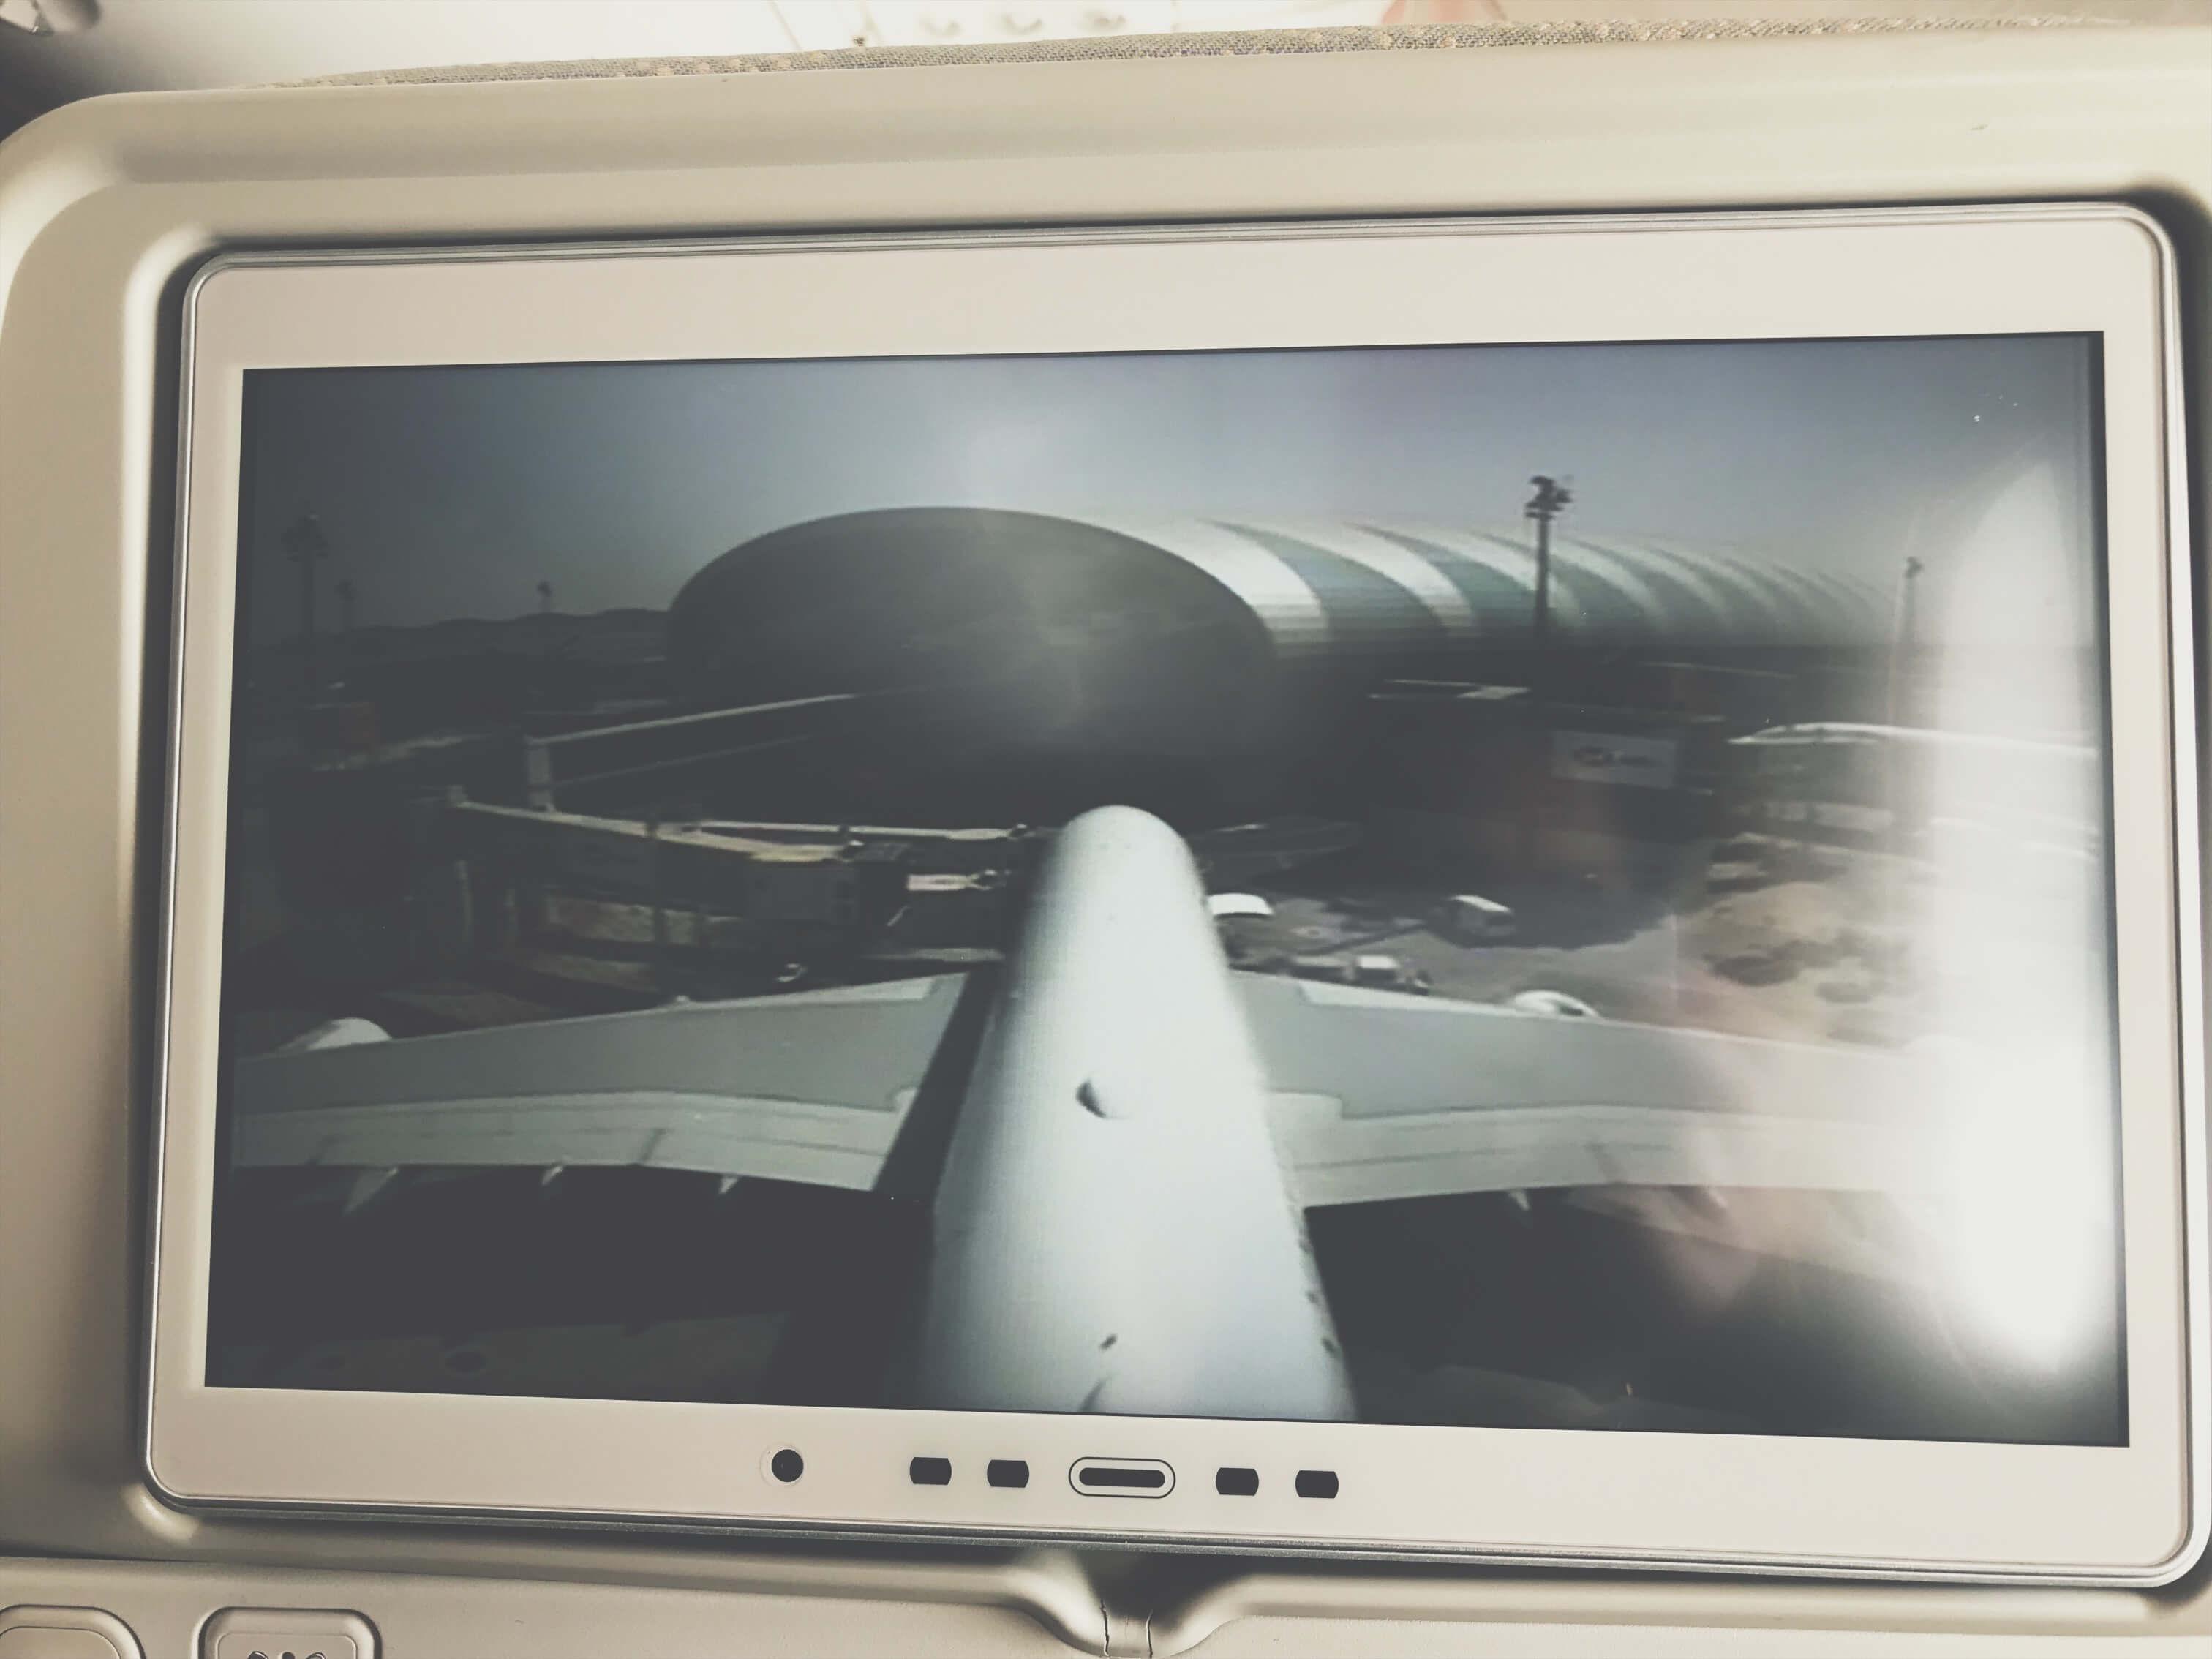 Nervige Flugzeugmomente Annaway Reiseblog Travelblog Reisen Travel Flugzeug